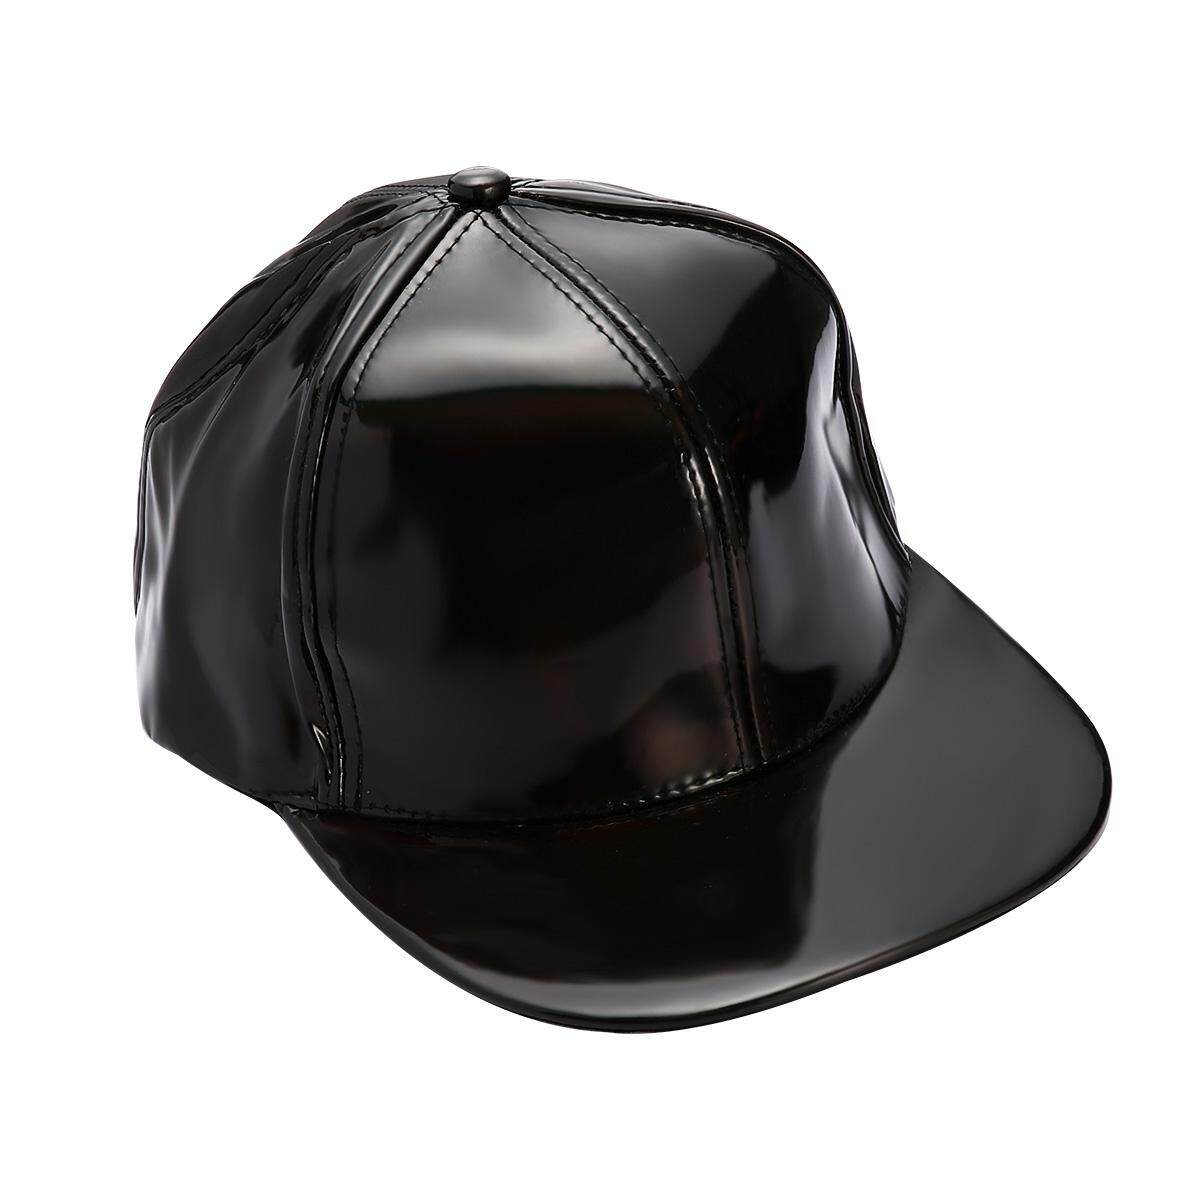 c4406716eb6e6 Unisex Silver Laser Baseball Cap Men Hip Hop Holographic Casquette Rainbow  Basketball Hat